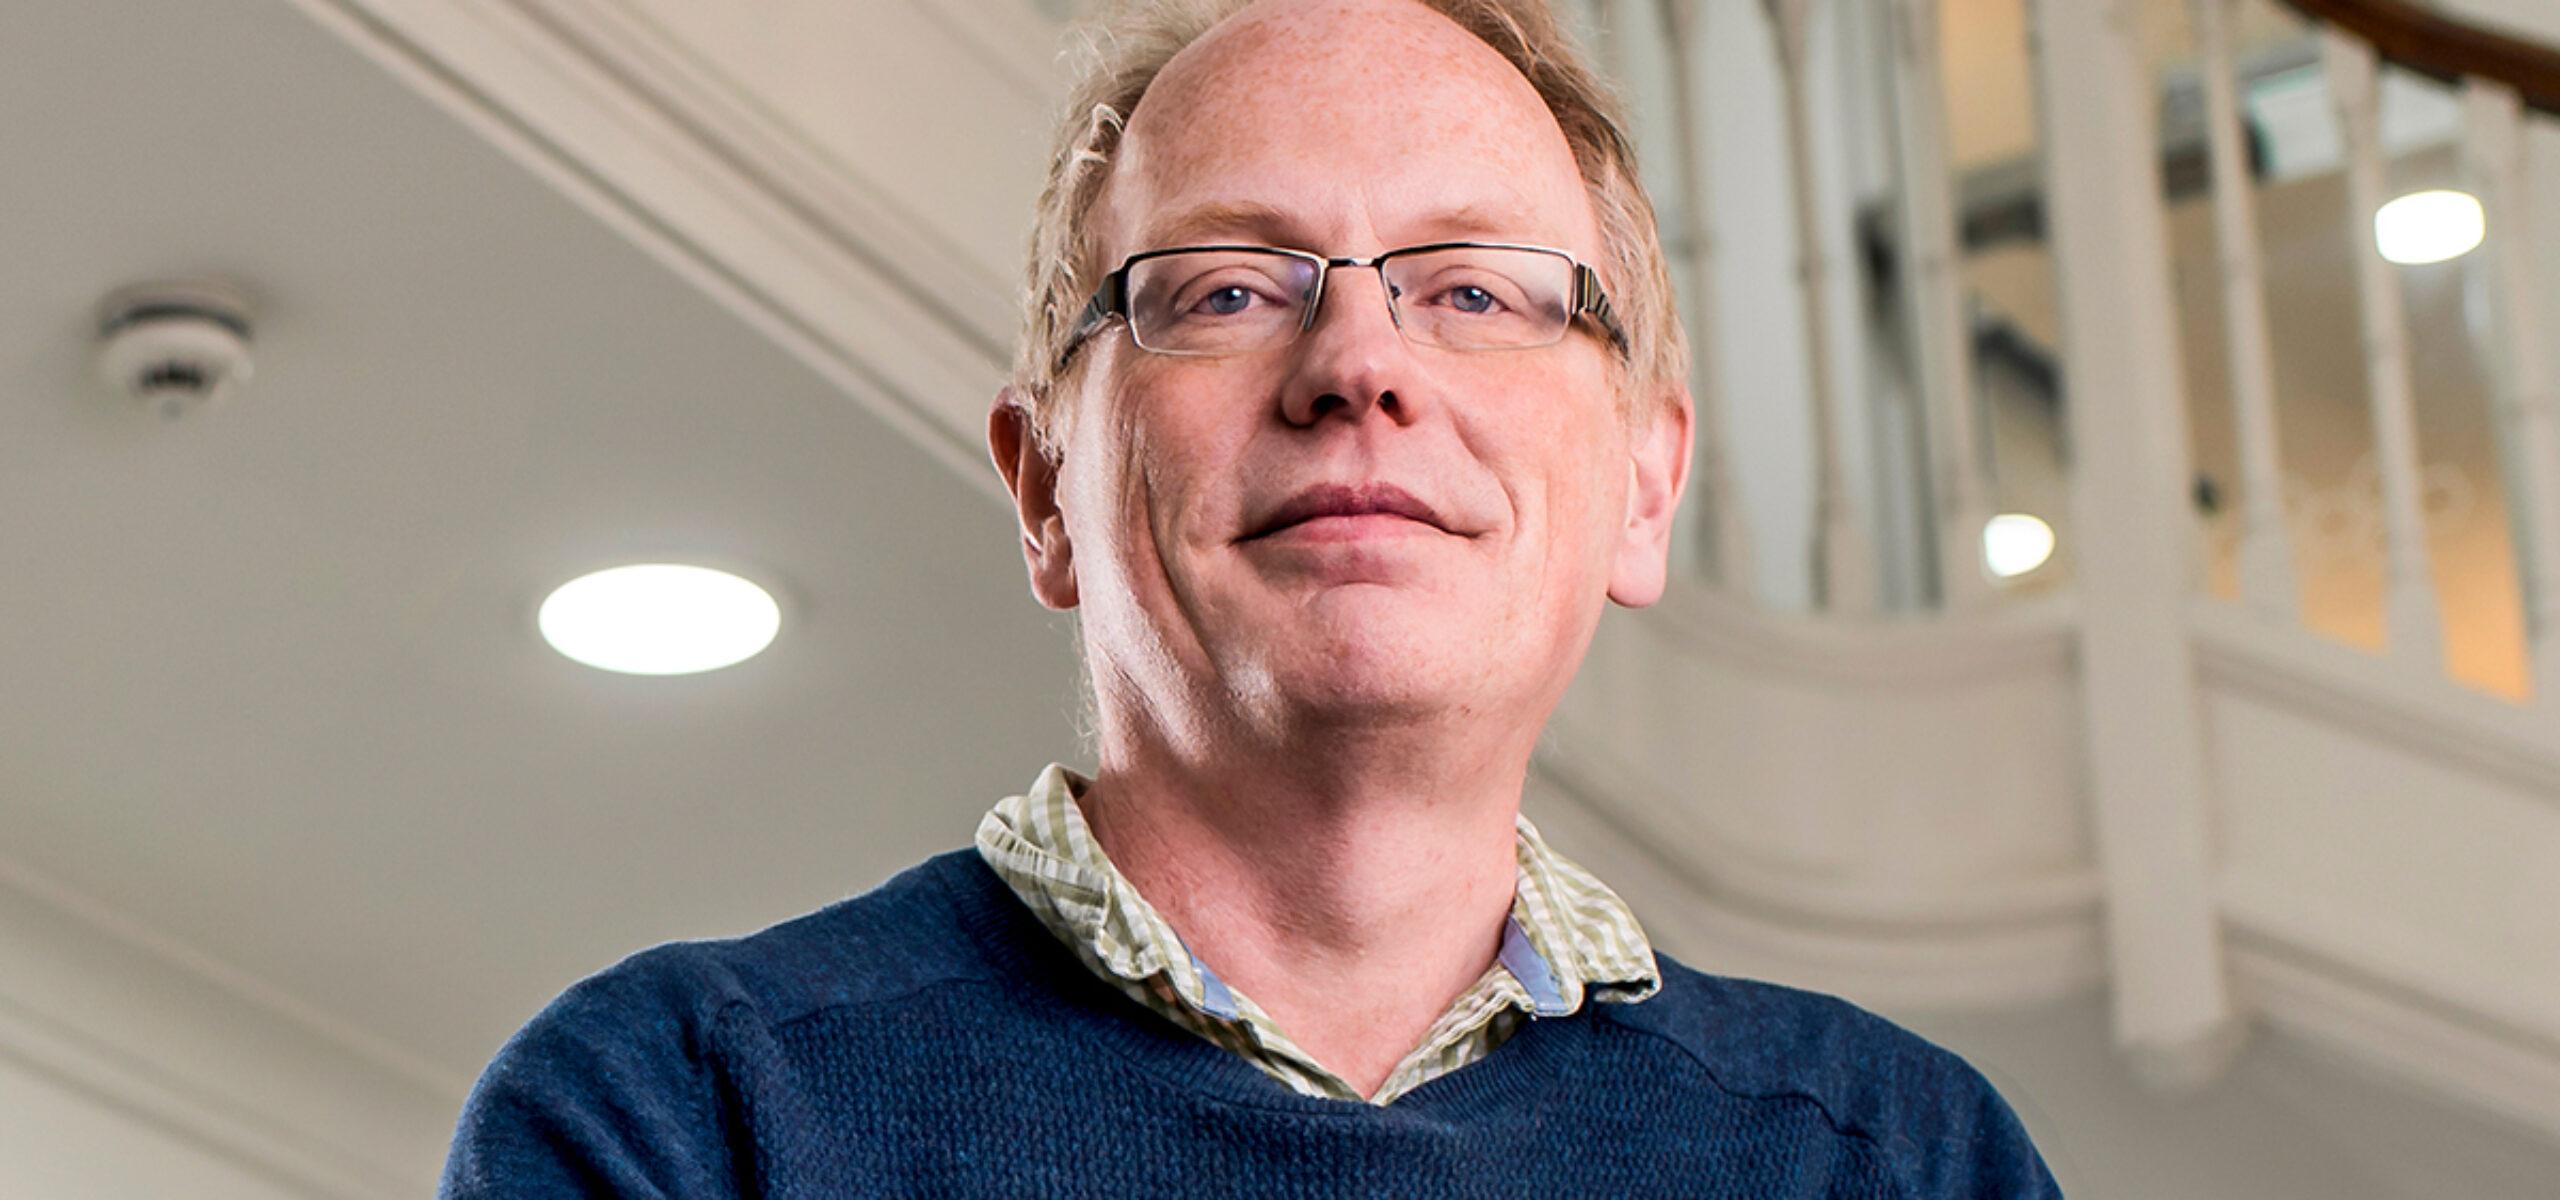 Professor Andy Brass, professor of bioinformatics at the University of Manchester